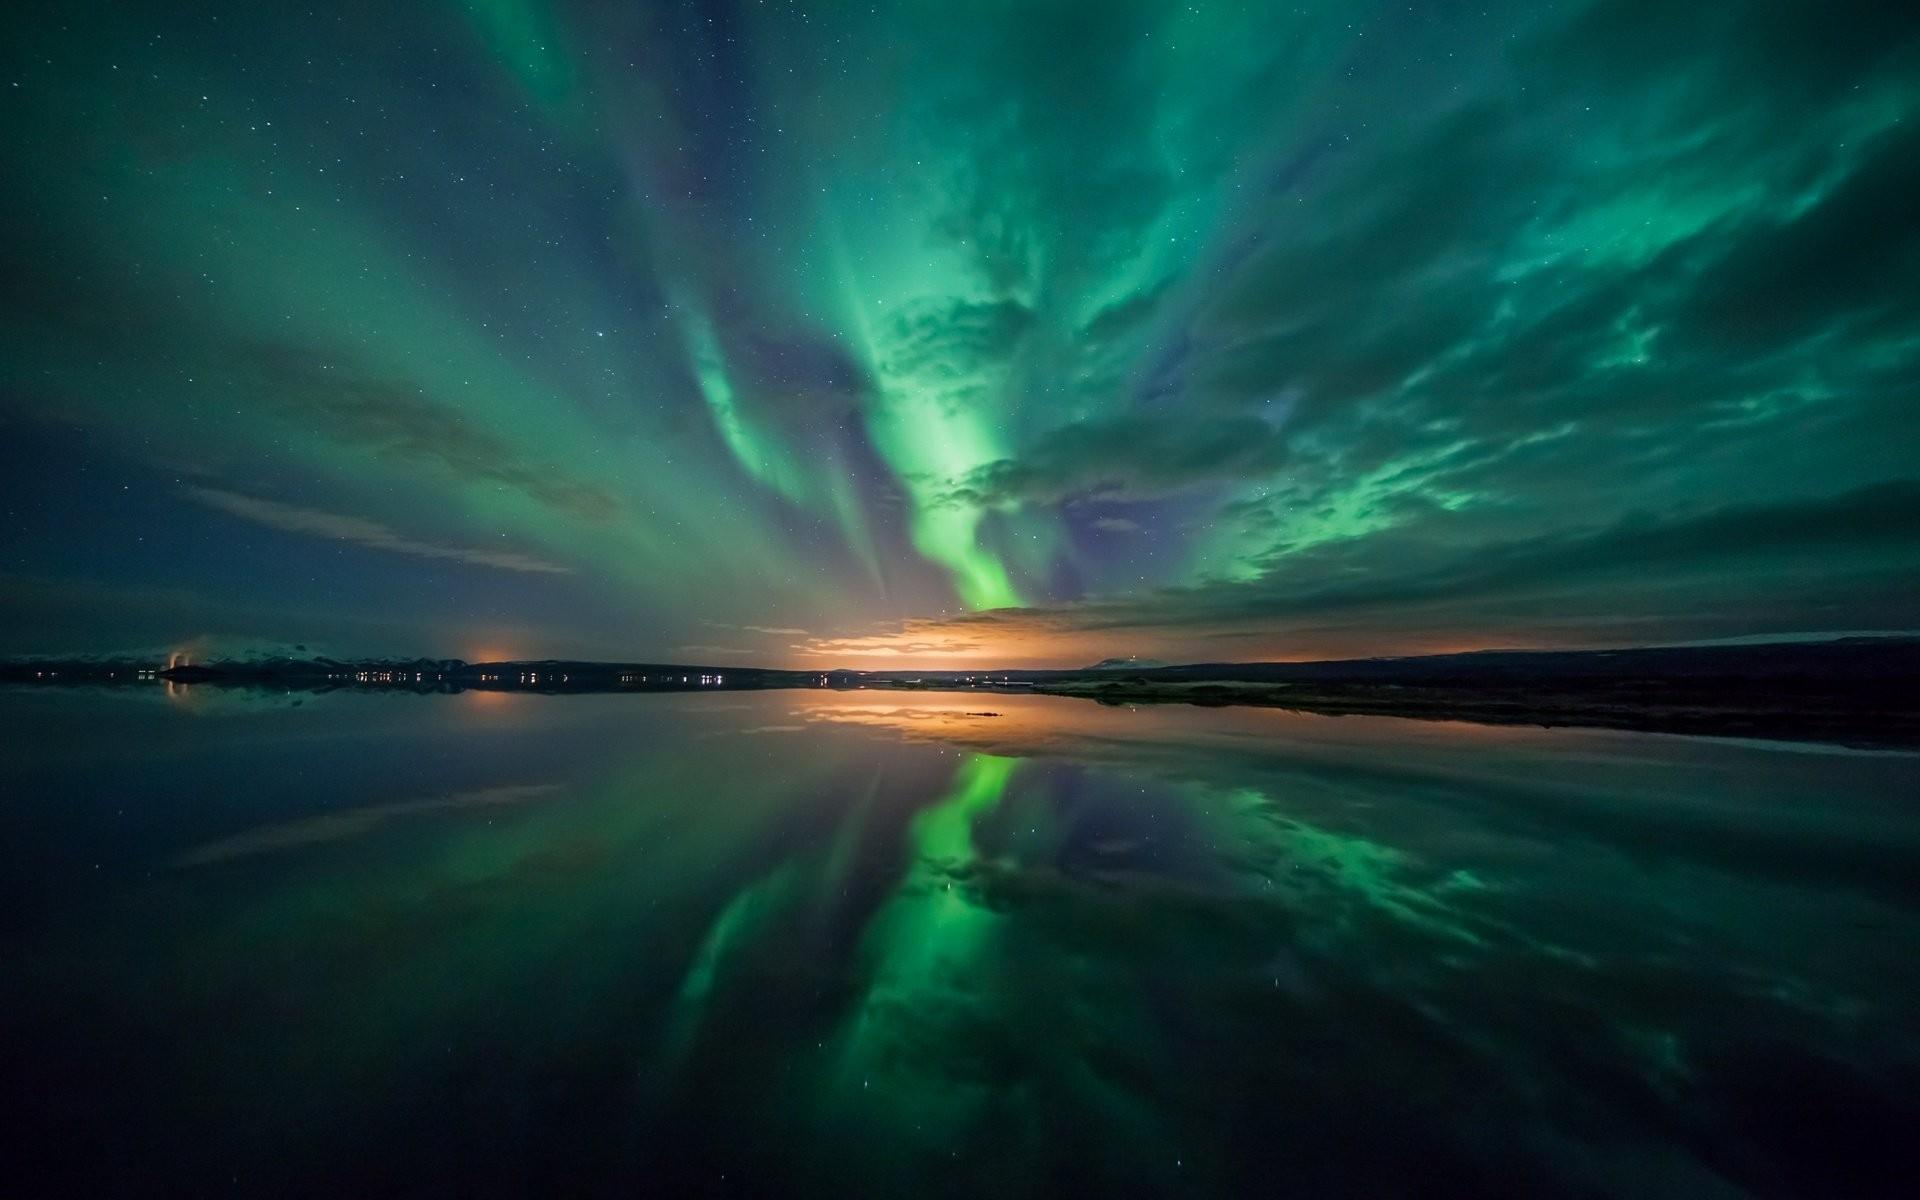 Aurora Borealis wallpaper ·① Download free HD wallpapers ...